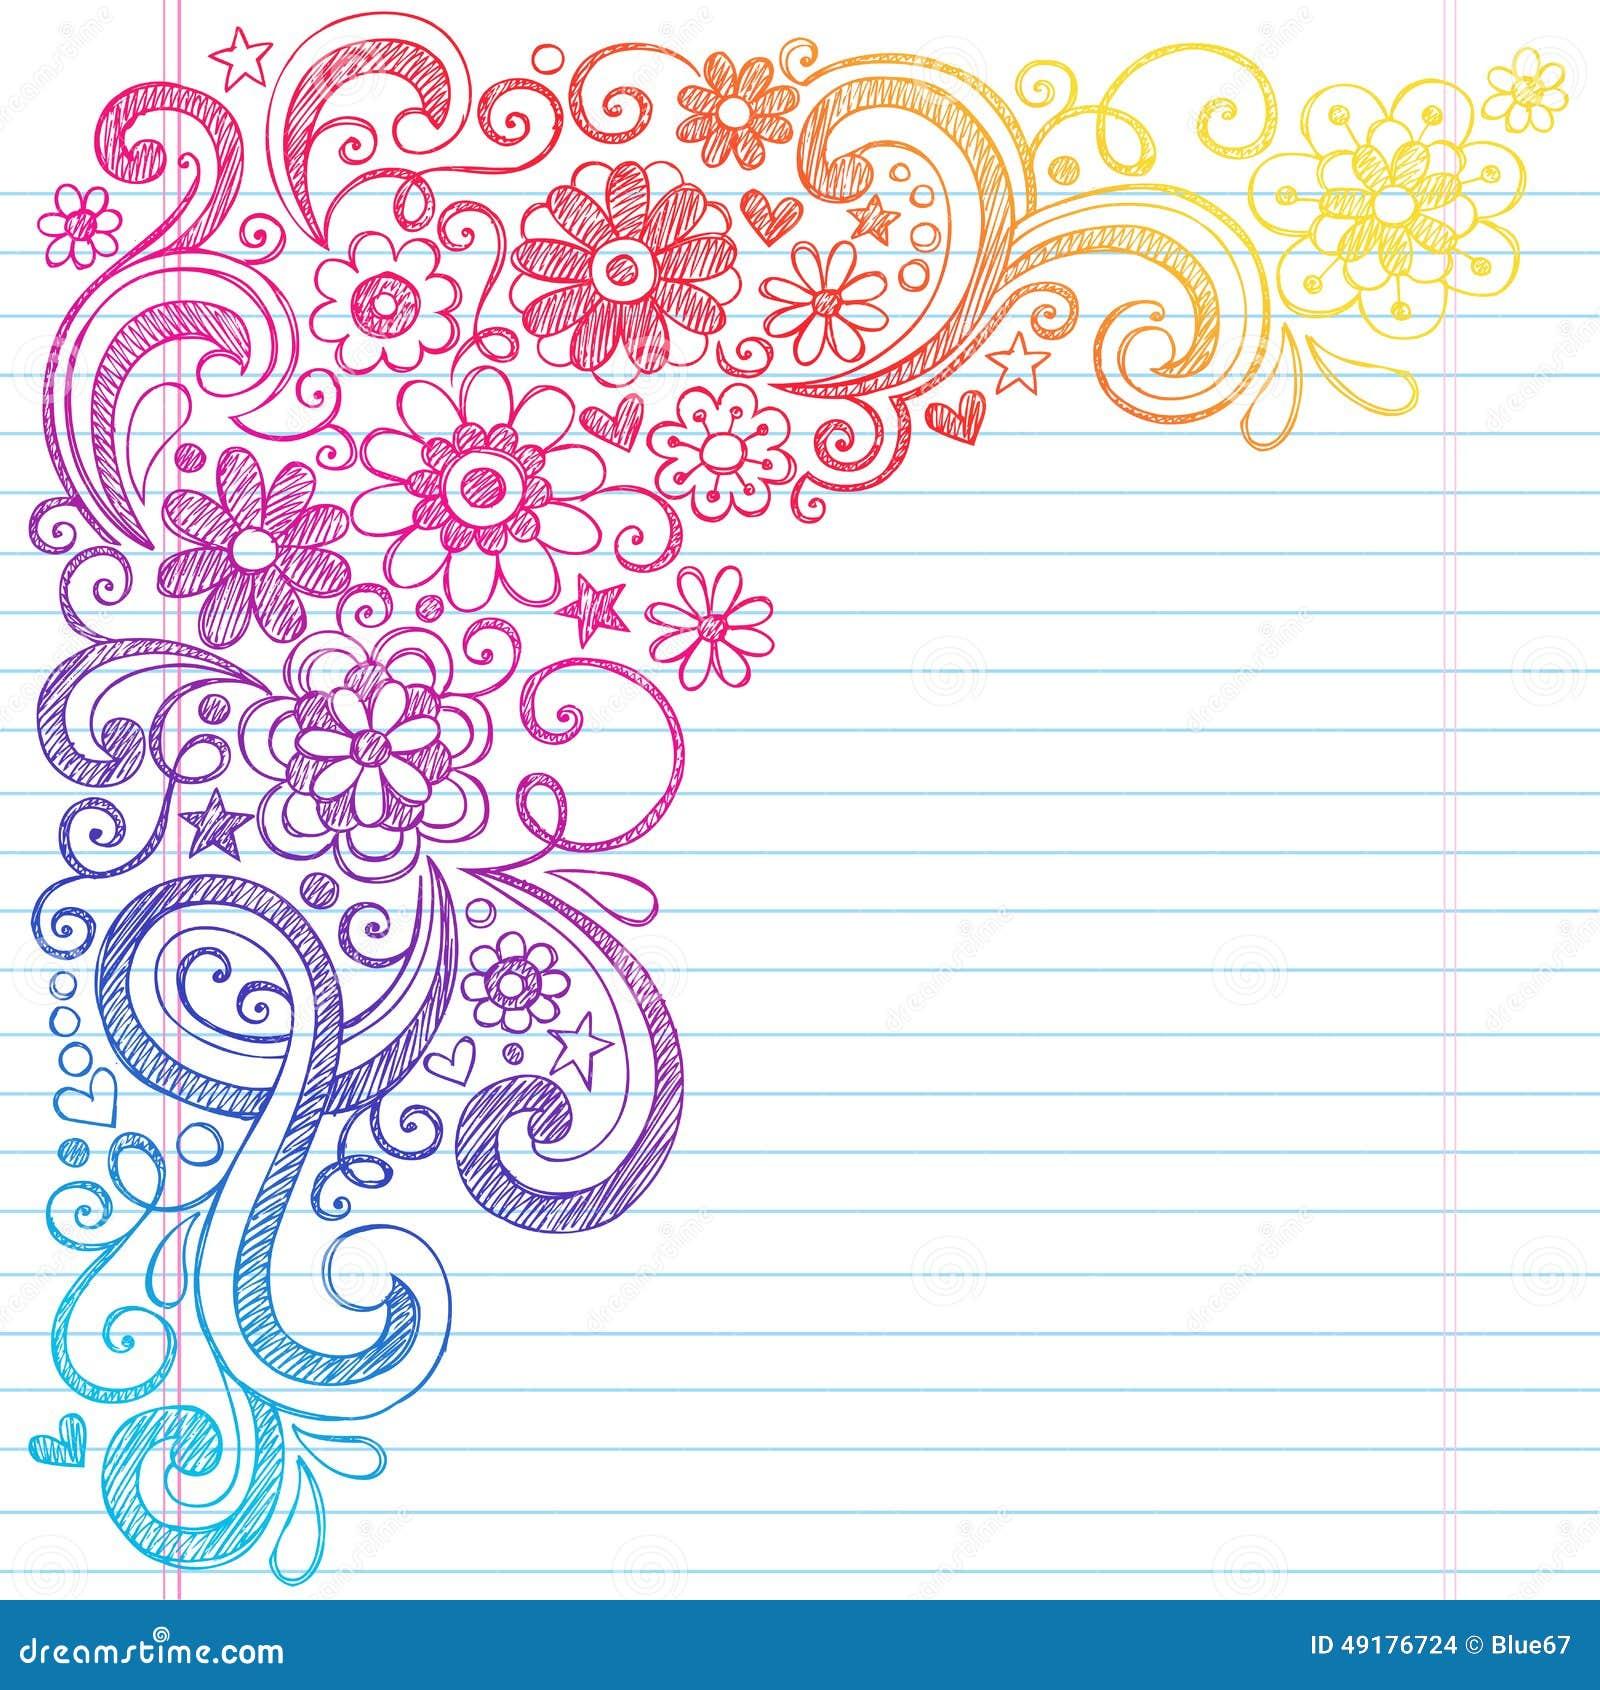 Flowers Sketchy School Notebook Doodles Vector Illustration